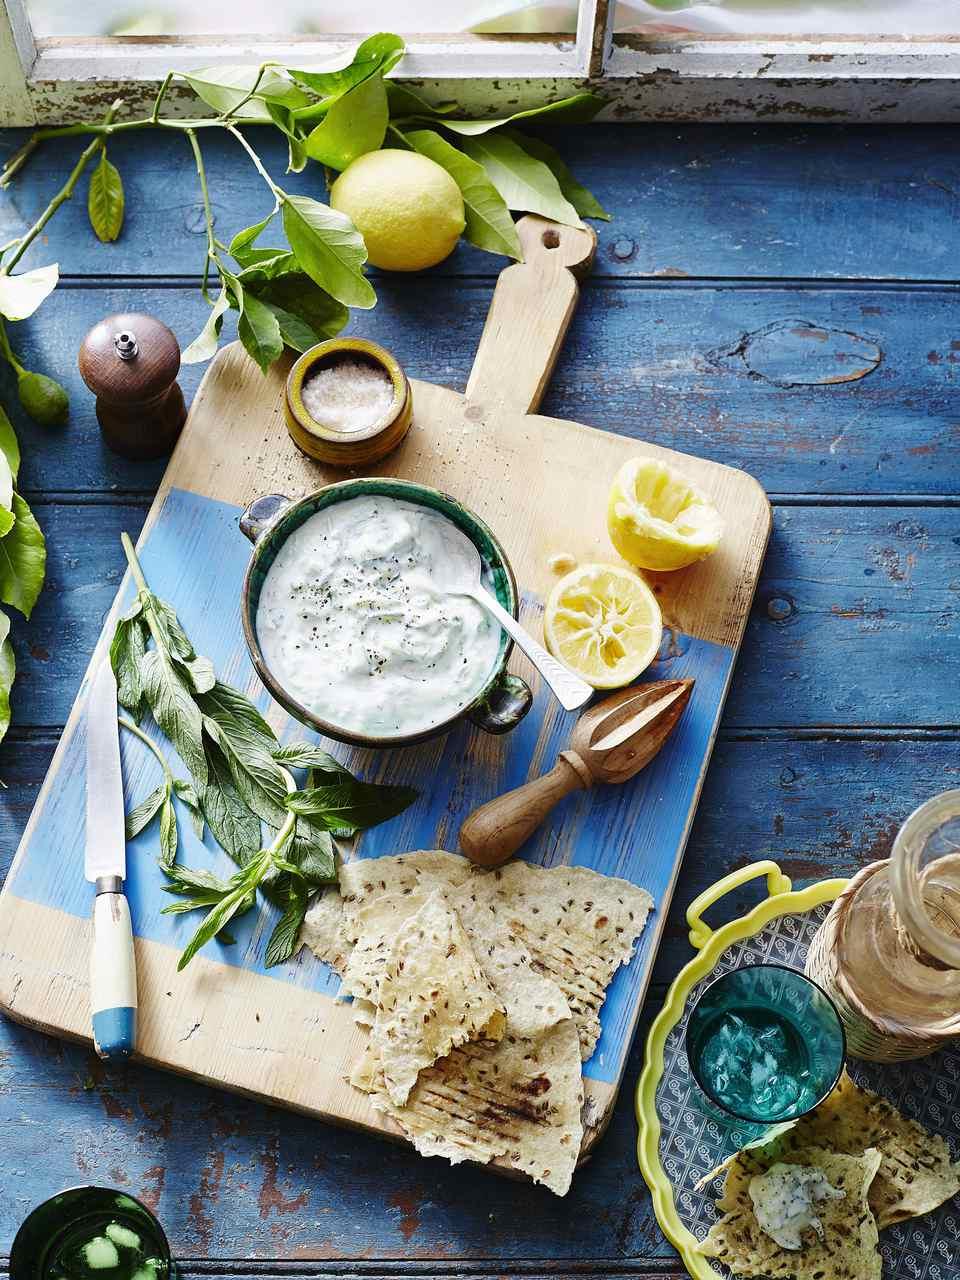 The ingredients for a Greek seasoning rub